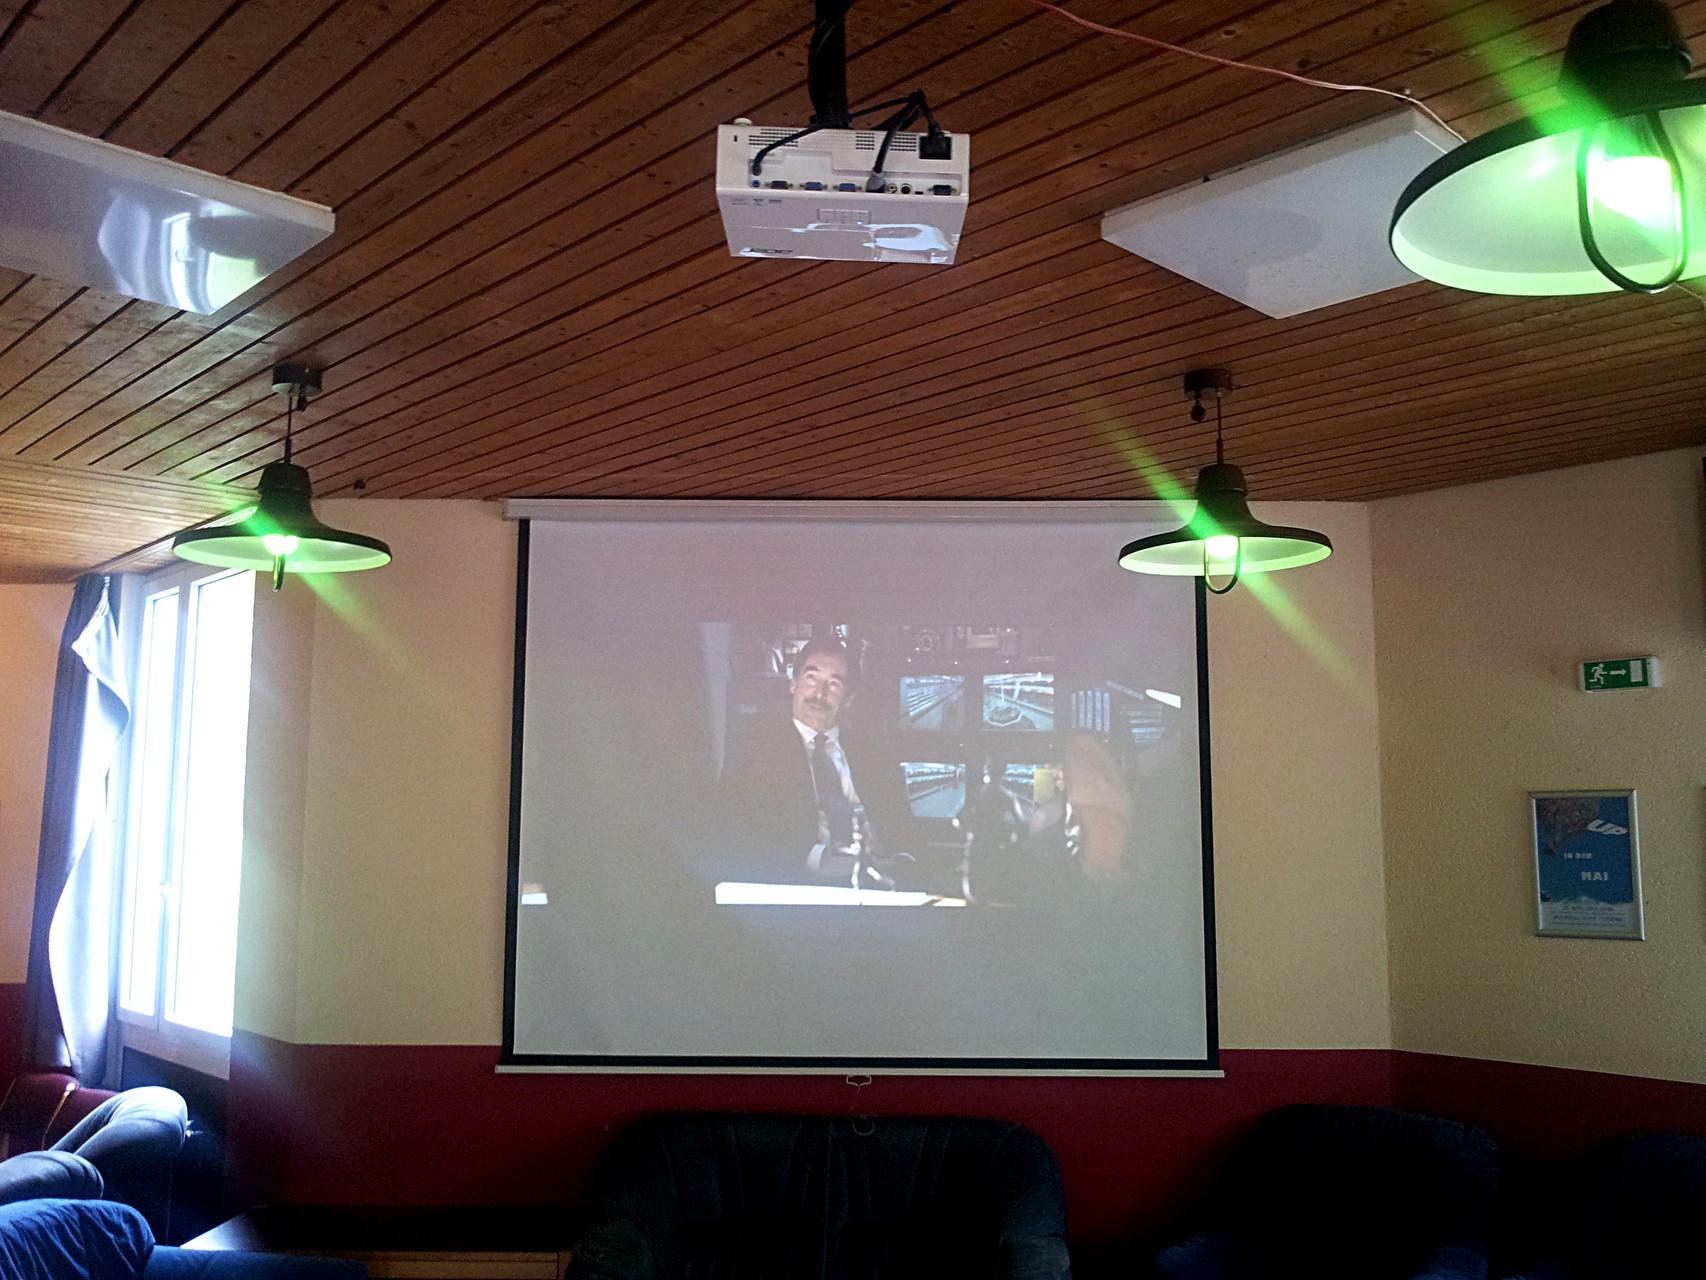 Clubraum in Haus I - Beamer